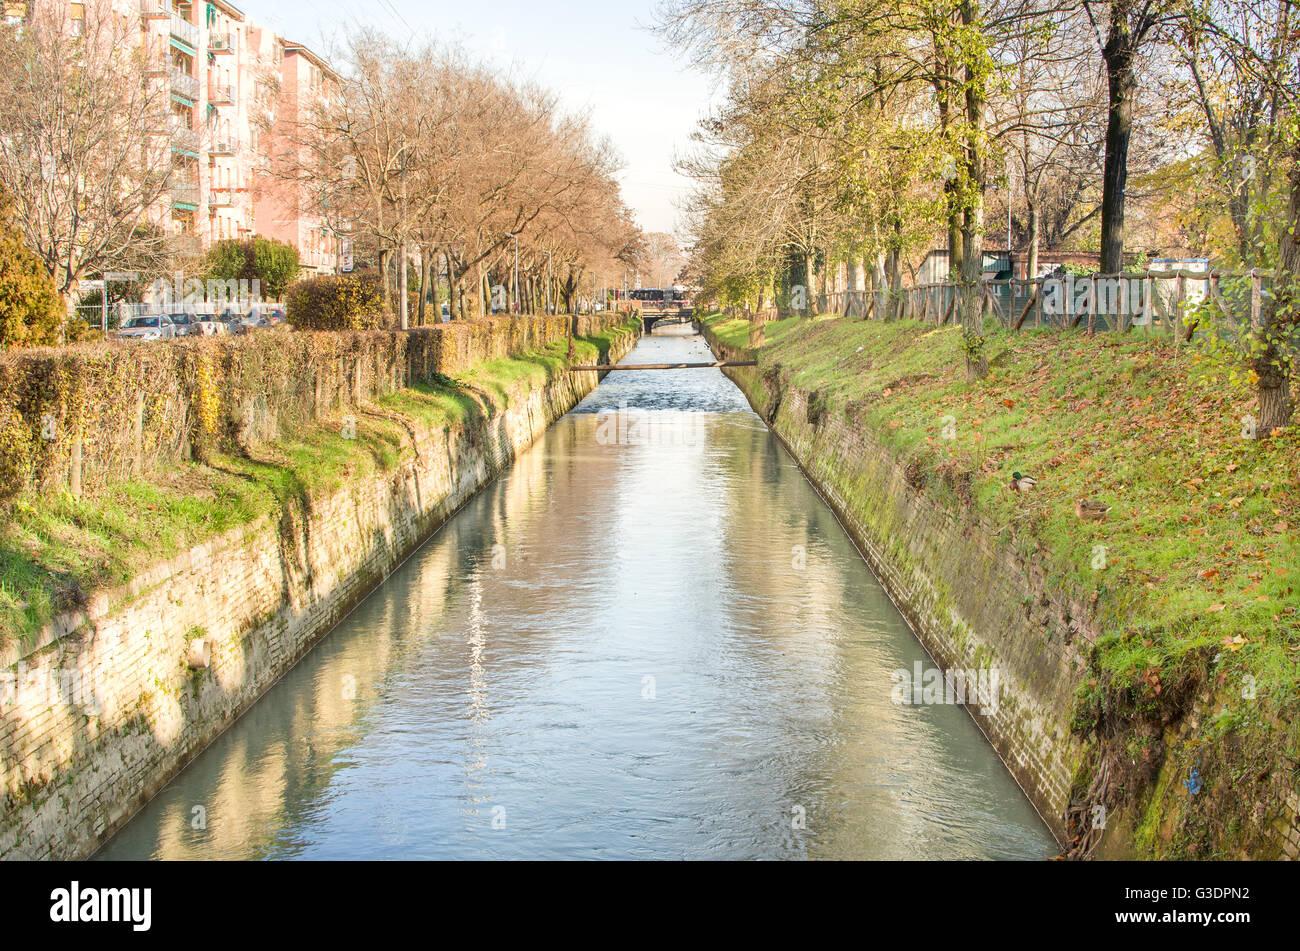 suburb river canal - Bologna Reno river - Stock Image